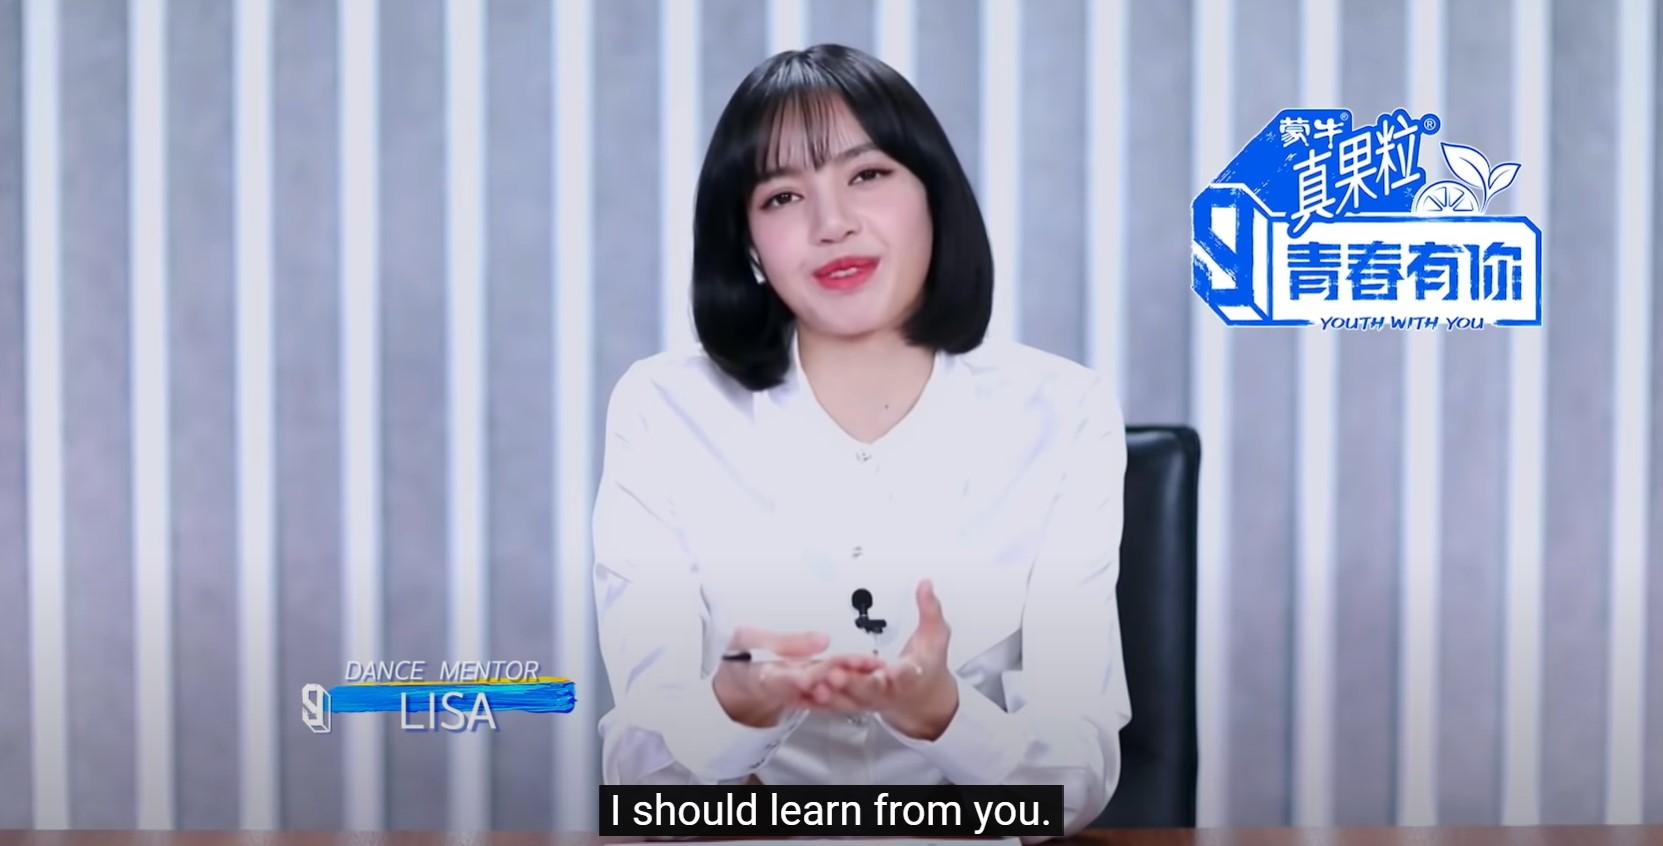 lisa learn